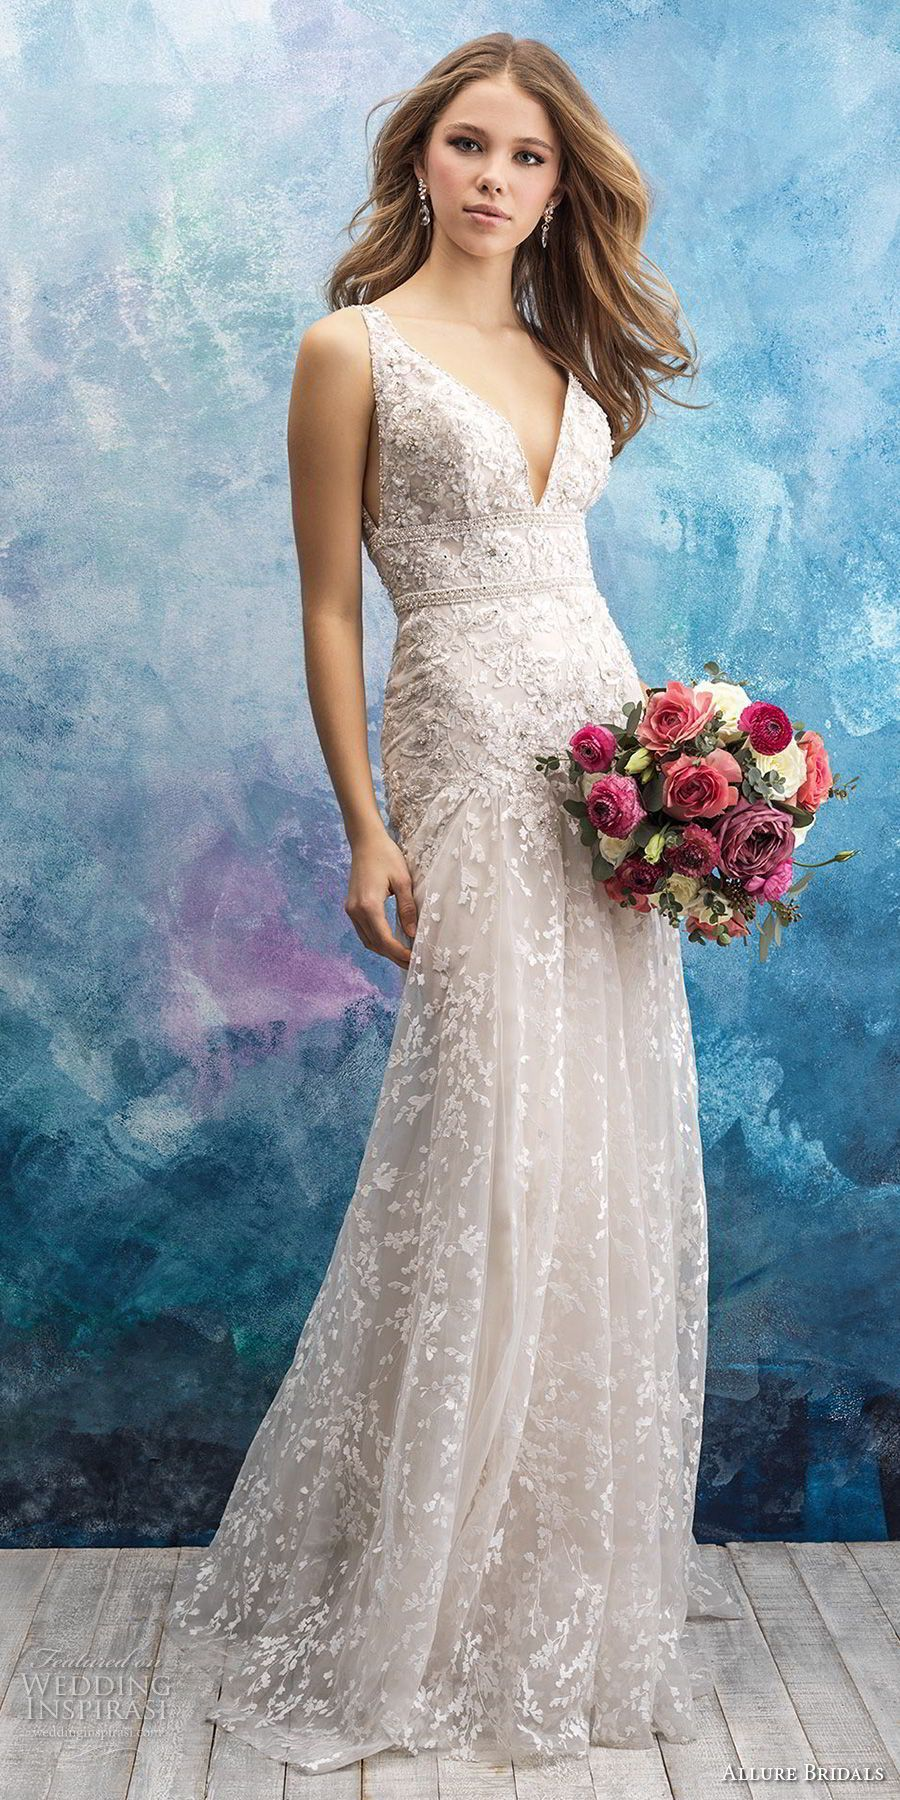 Allure wedding dress  Allure Bridals Fall  Wedding Dresses  Wedding Tips  Pinterest